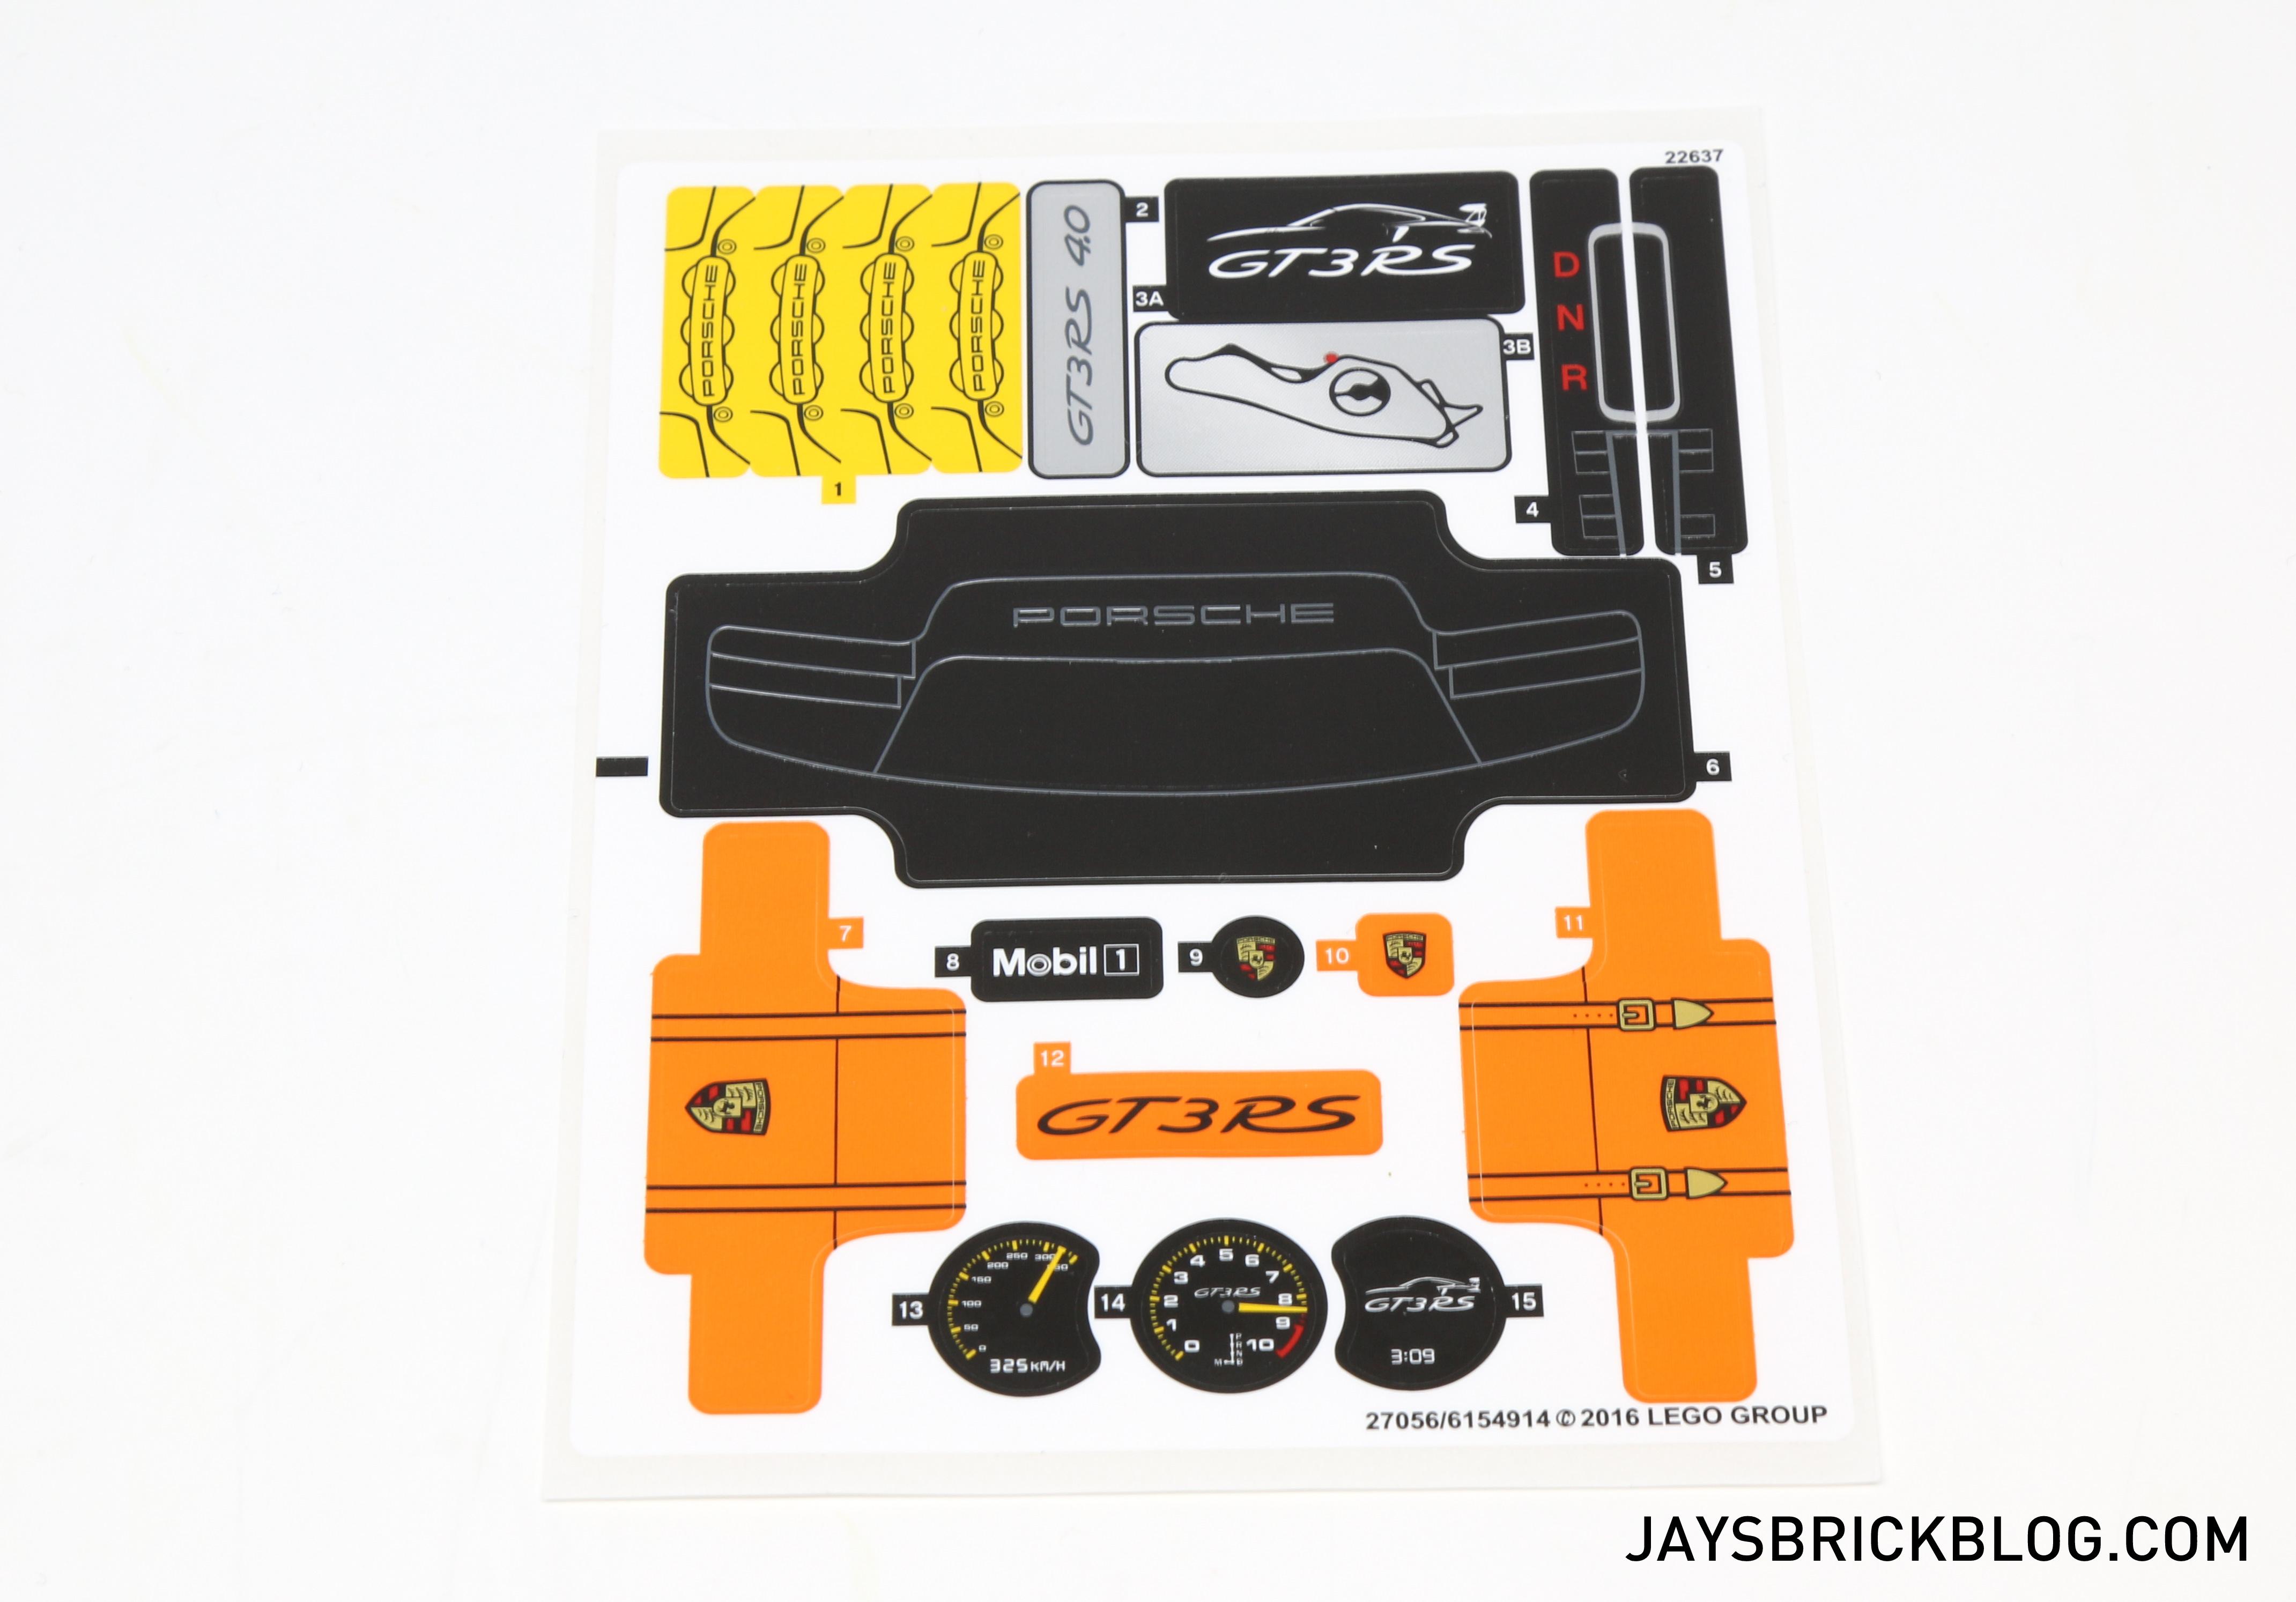 Unboxing The Lego Technic 42056 Porsche 911 Gt3 Rs Jays